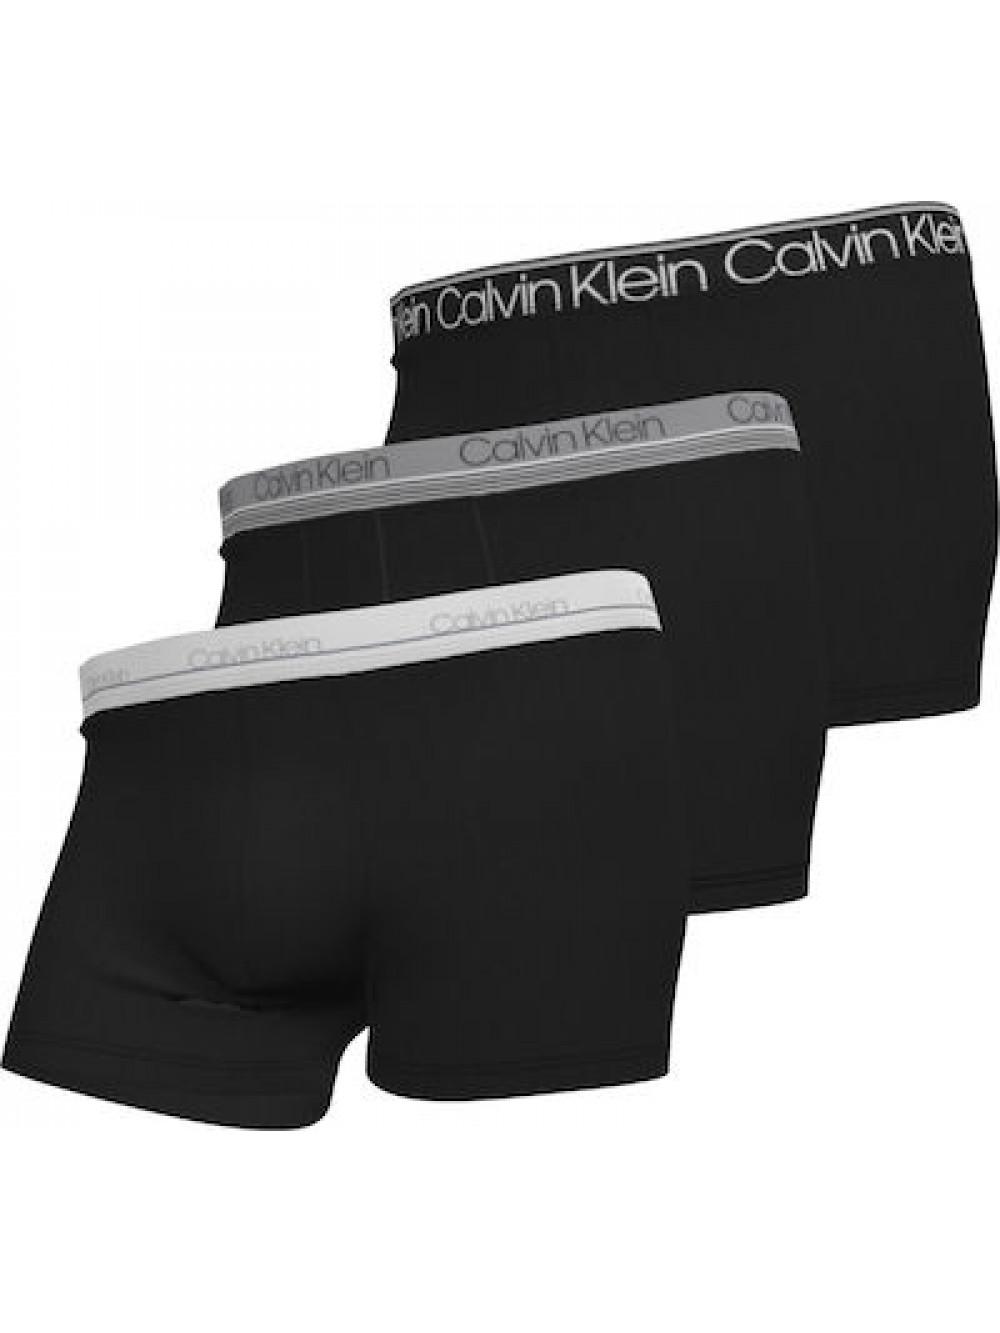 Férfi boxeralsó Calvin Klein Cotton Stretch Trunk 3-pack fekete